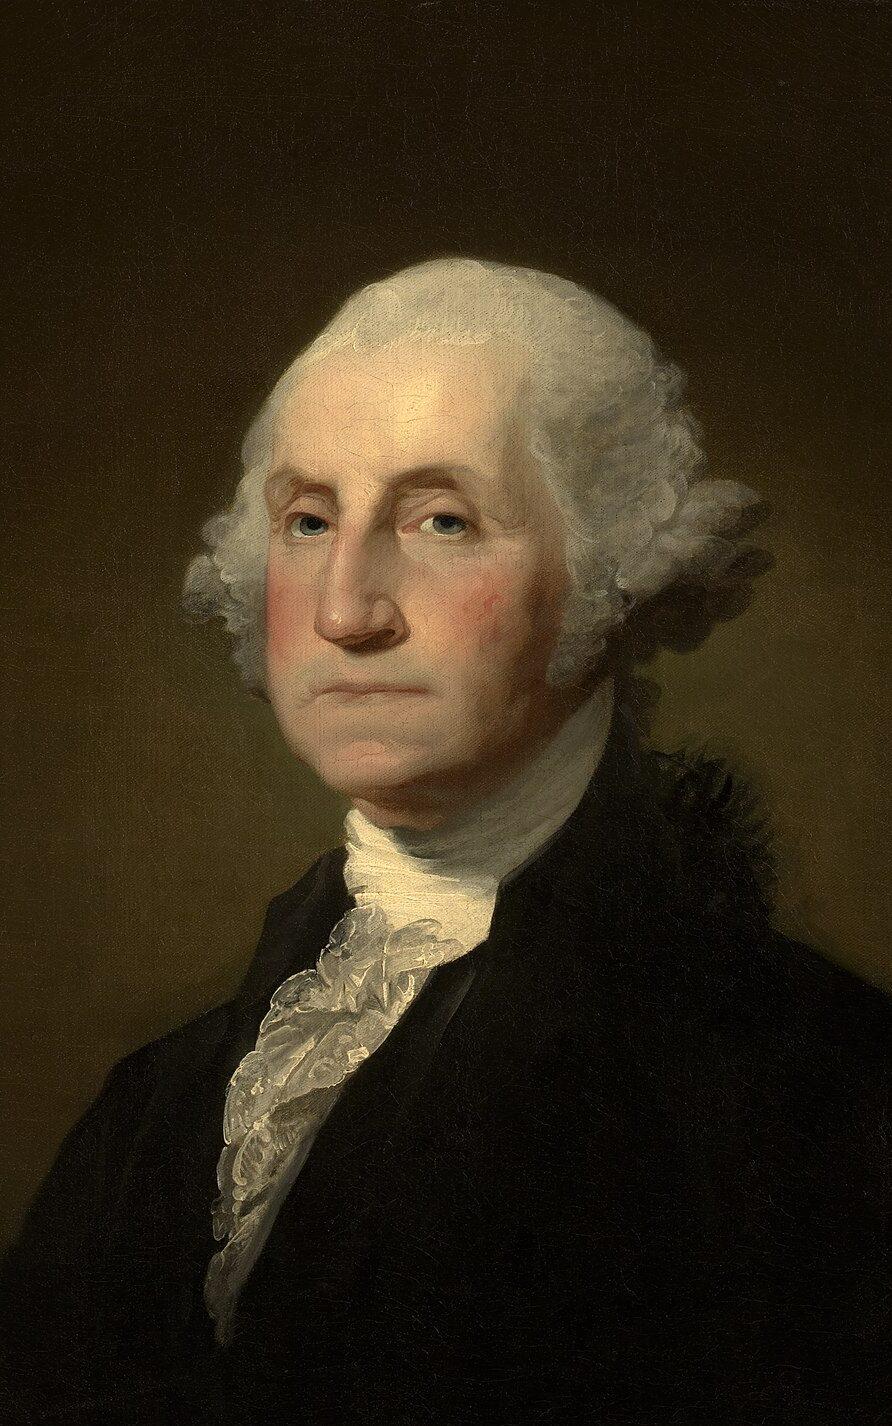 1280px-Gilbert_Stuart_Williamstown_Portrait_of_George_Washington-edited.jpg